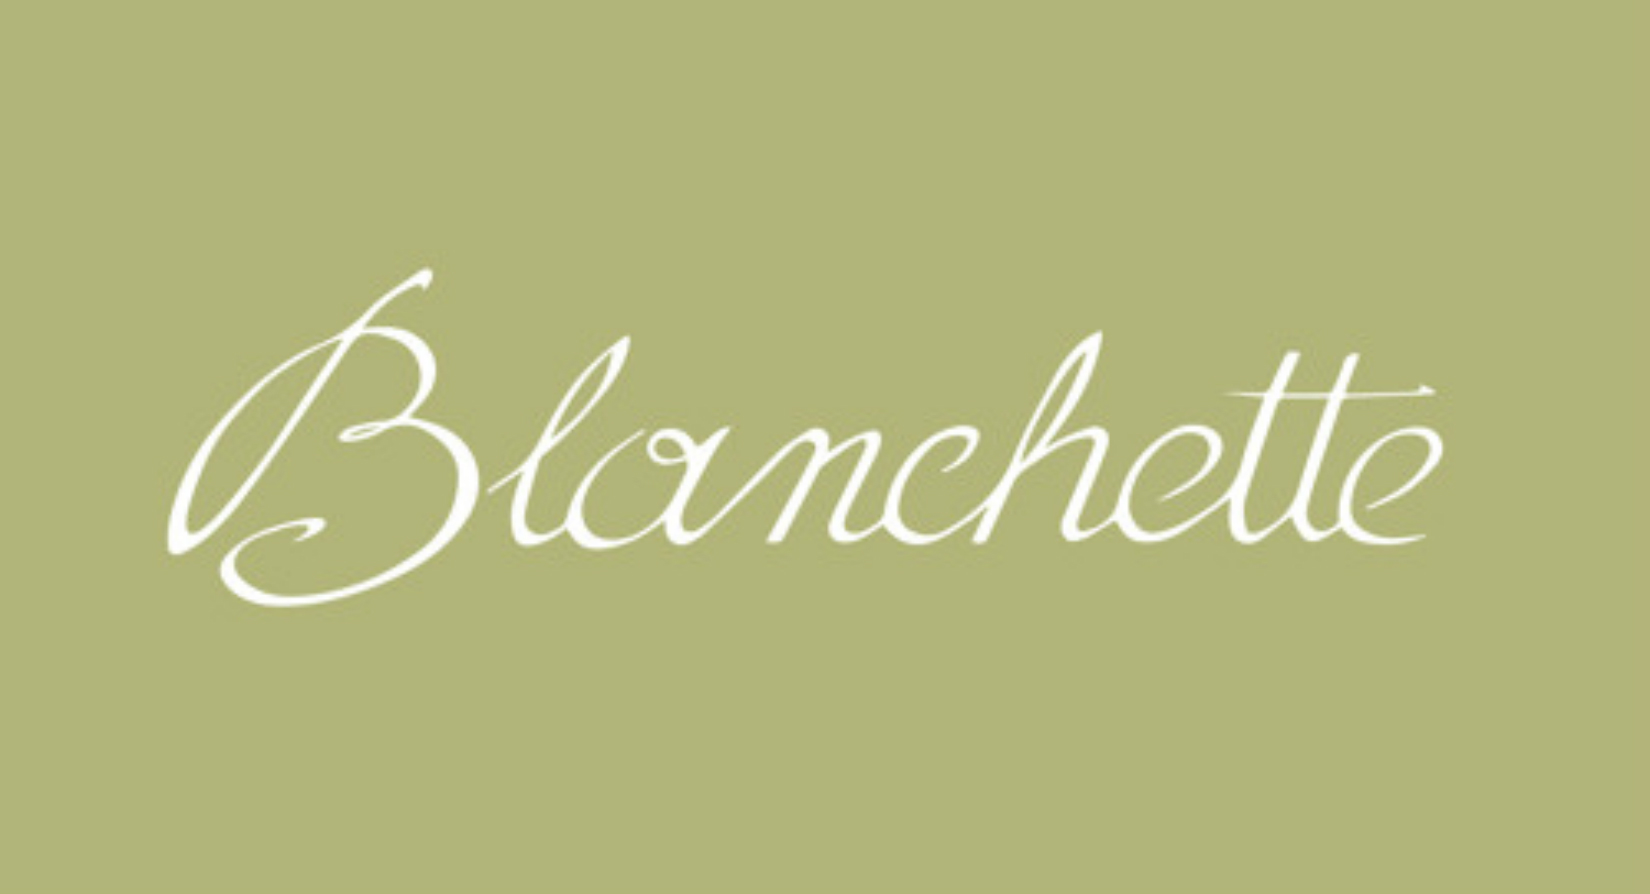 Mid-Week Meals: Blanchette's Lentil Vinaigrette